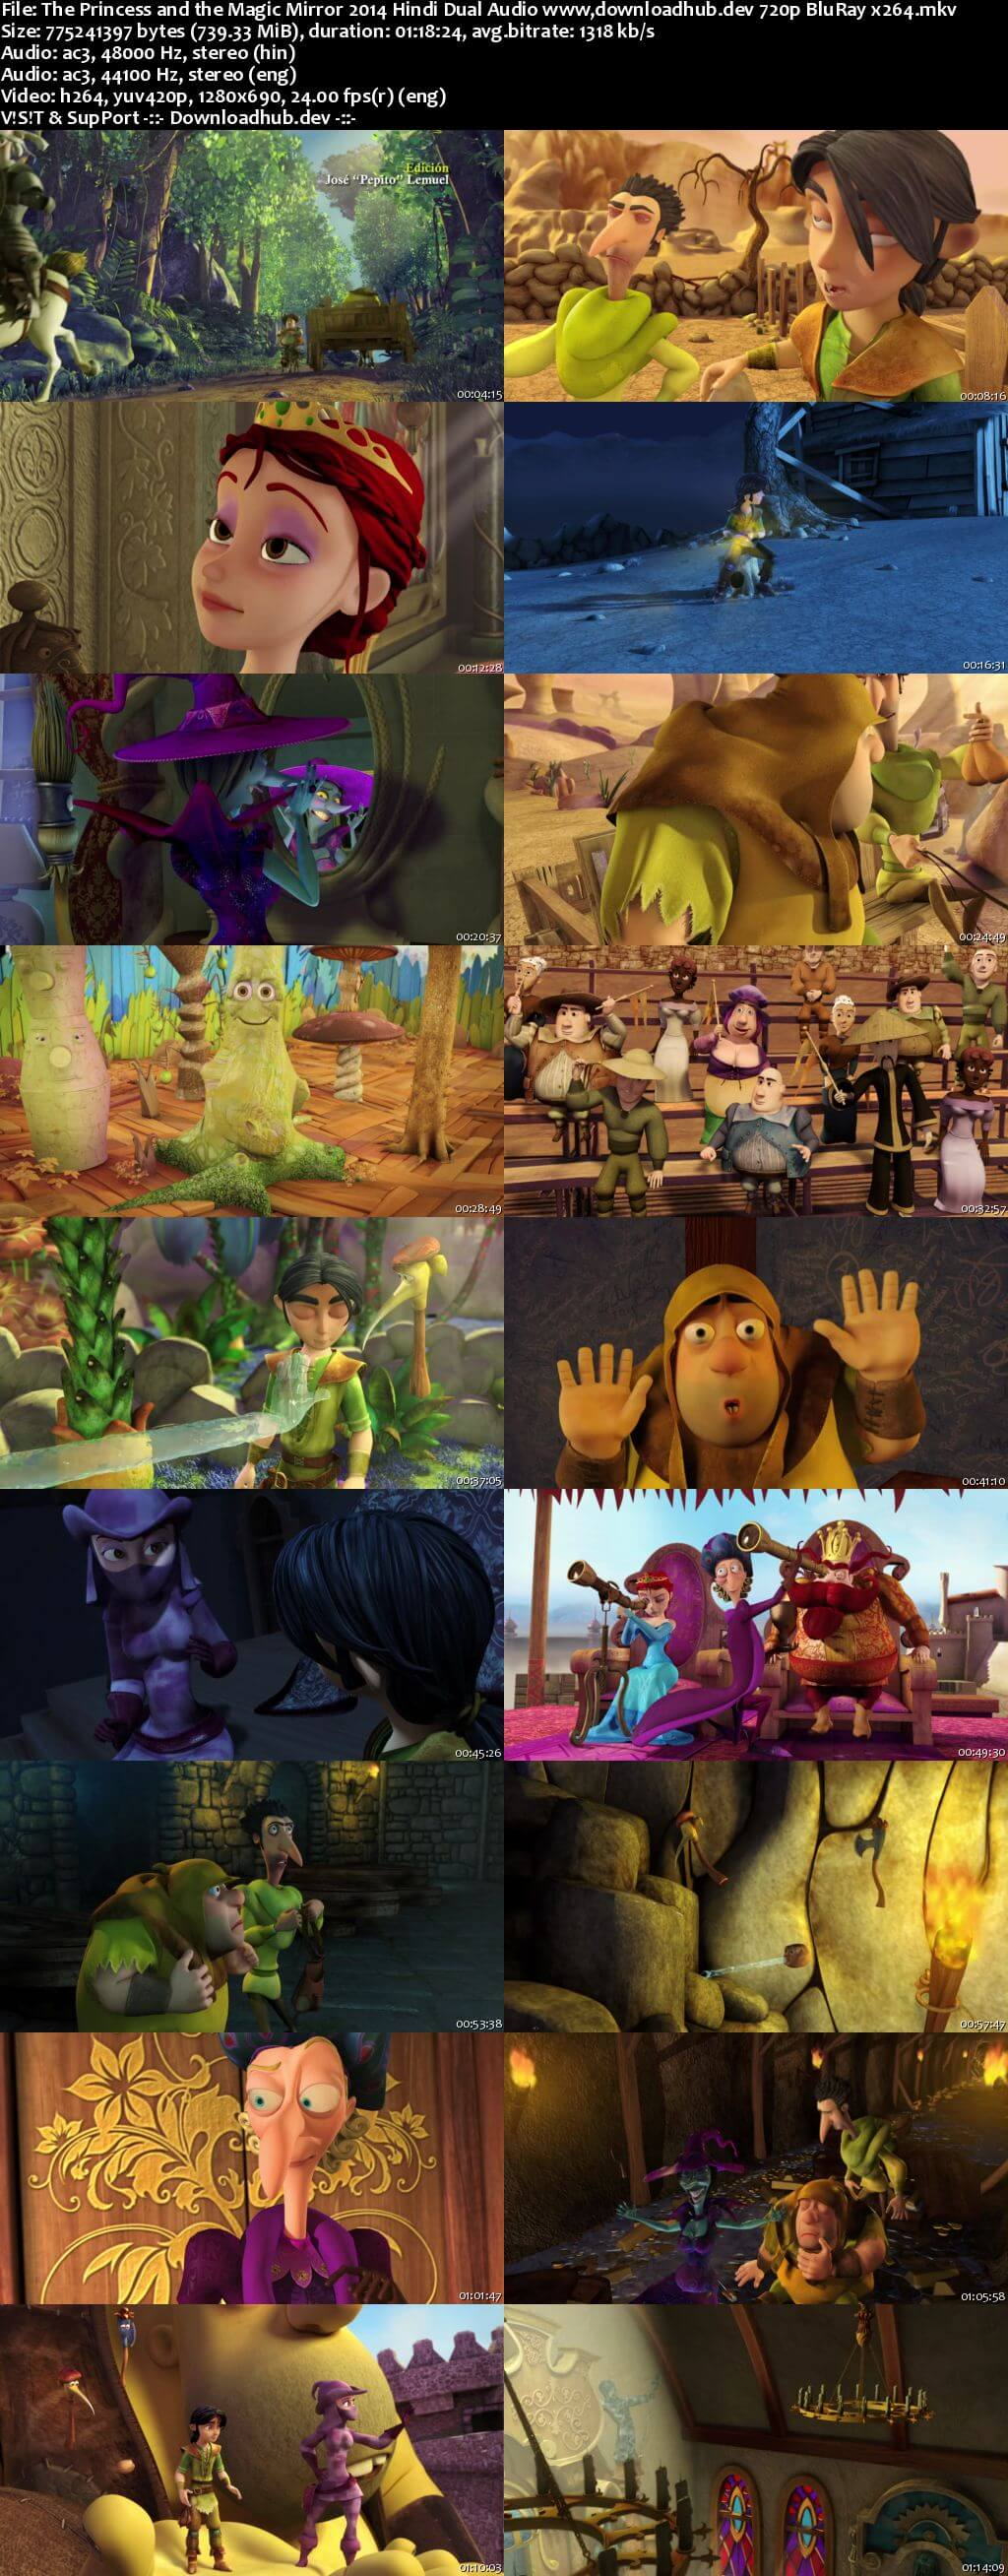 The Princess and the Magic Mirror 2014 Hindi Dual Audio 720p BluRay x264